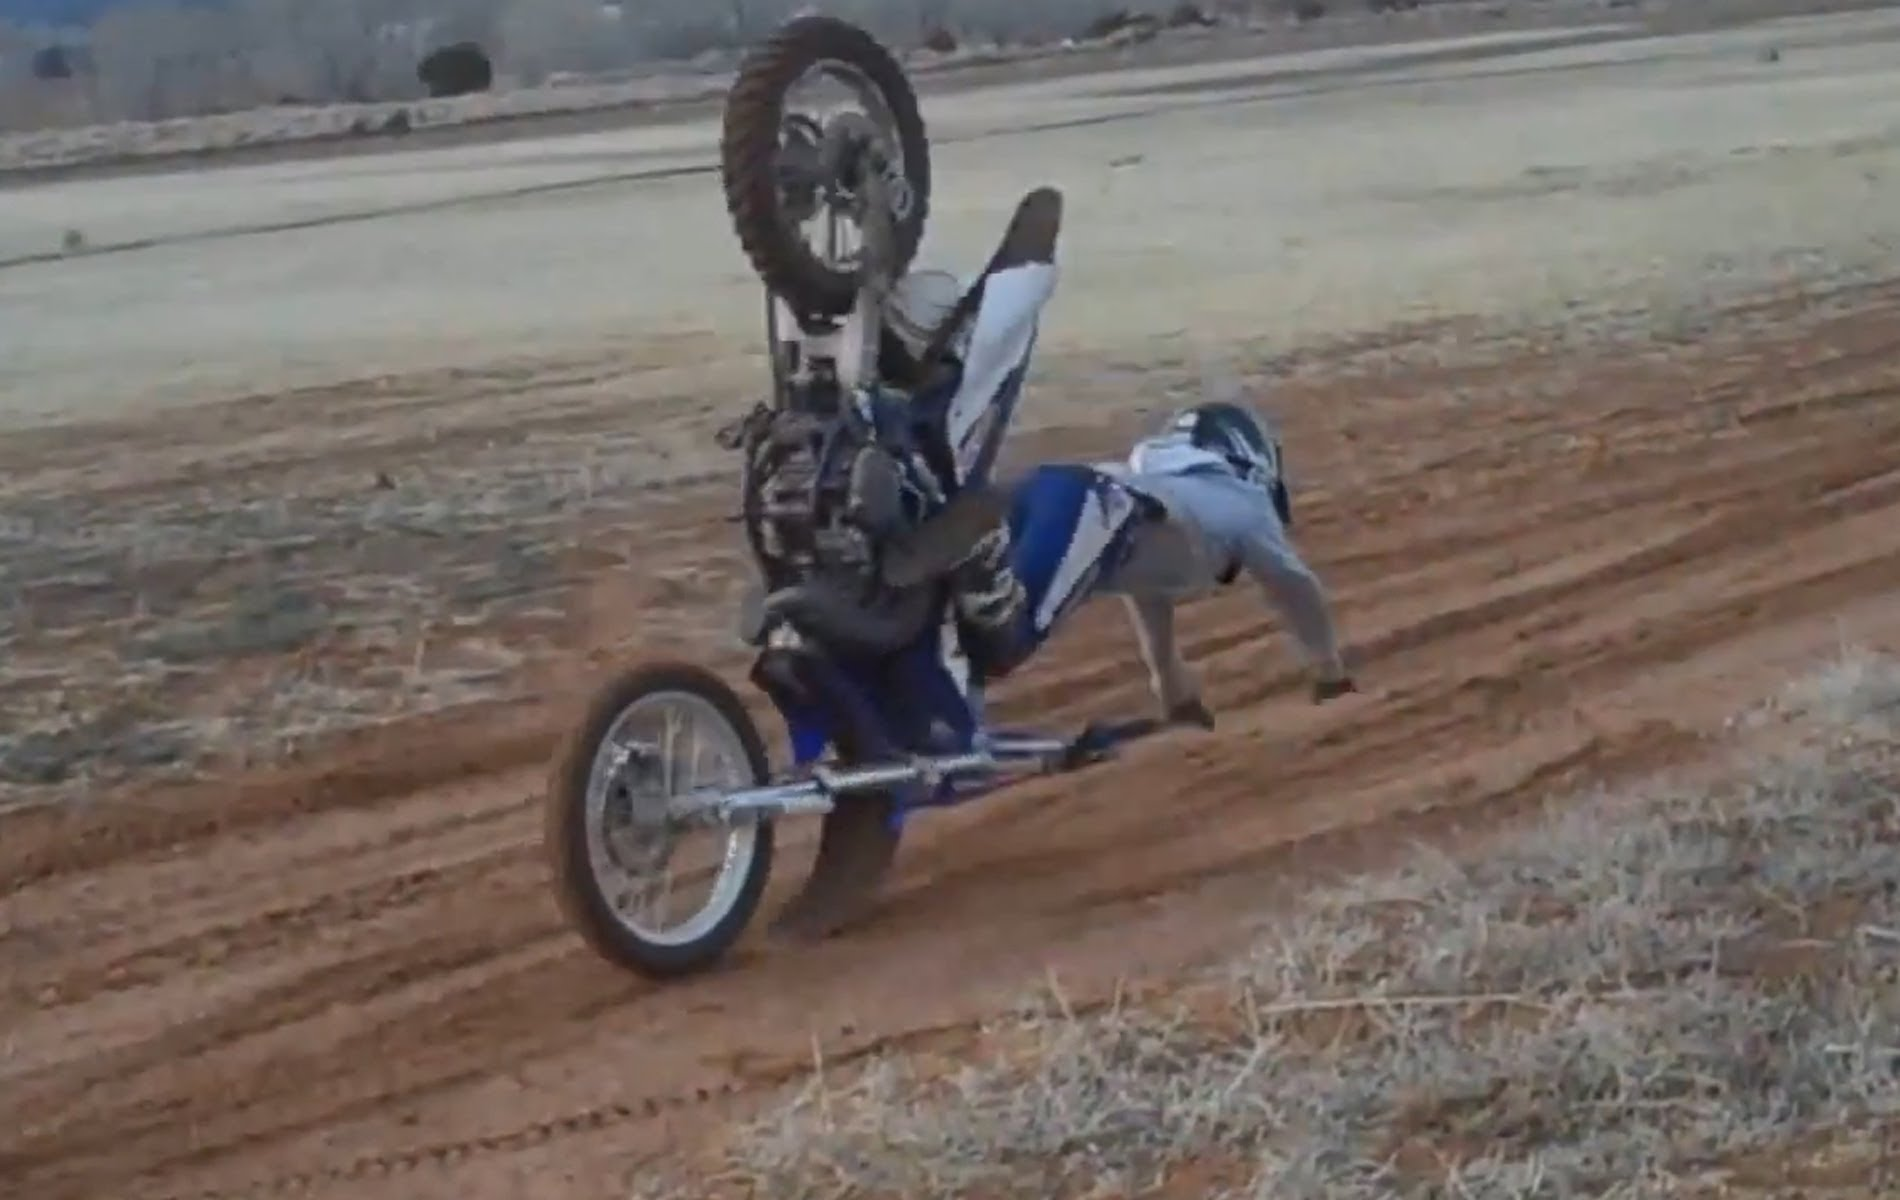 Yamaha clipart dirt bike #17] CRASHES/FAILS 2015 YAMAHA Compilation